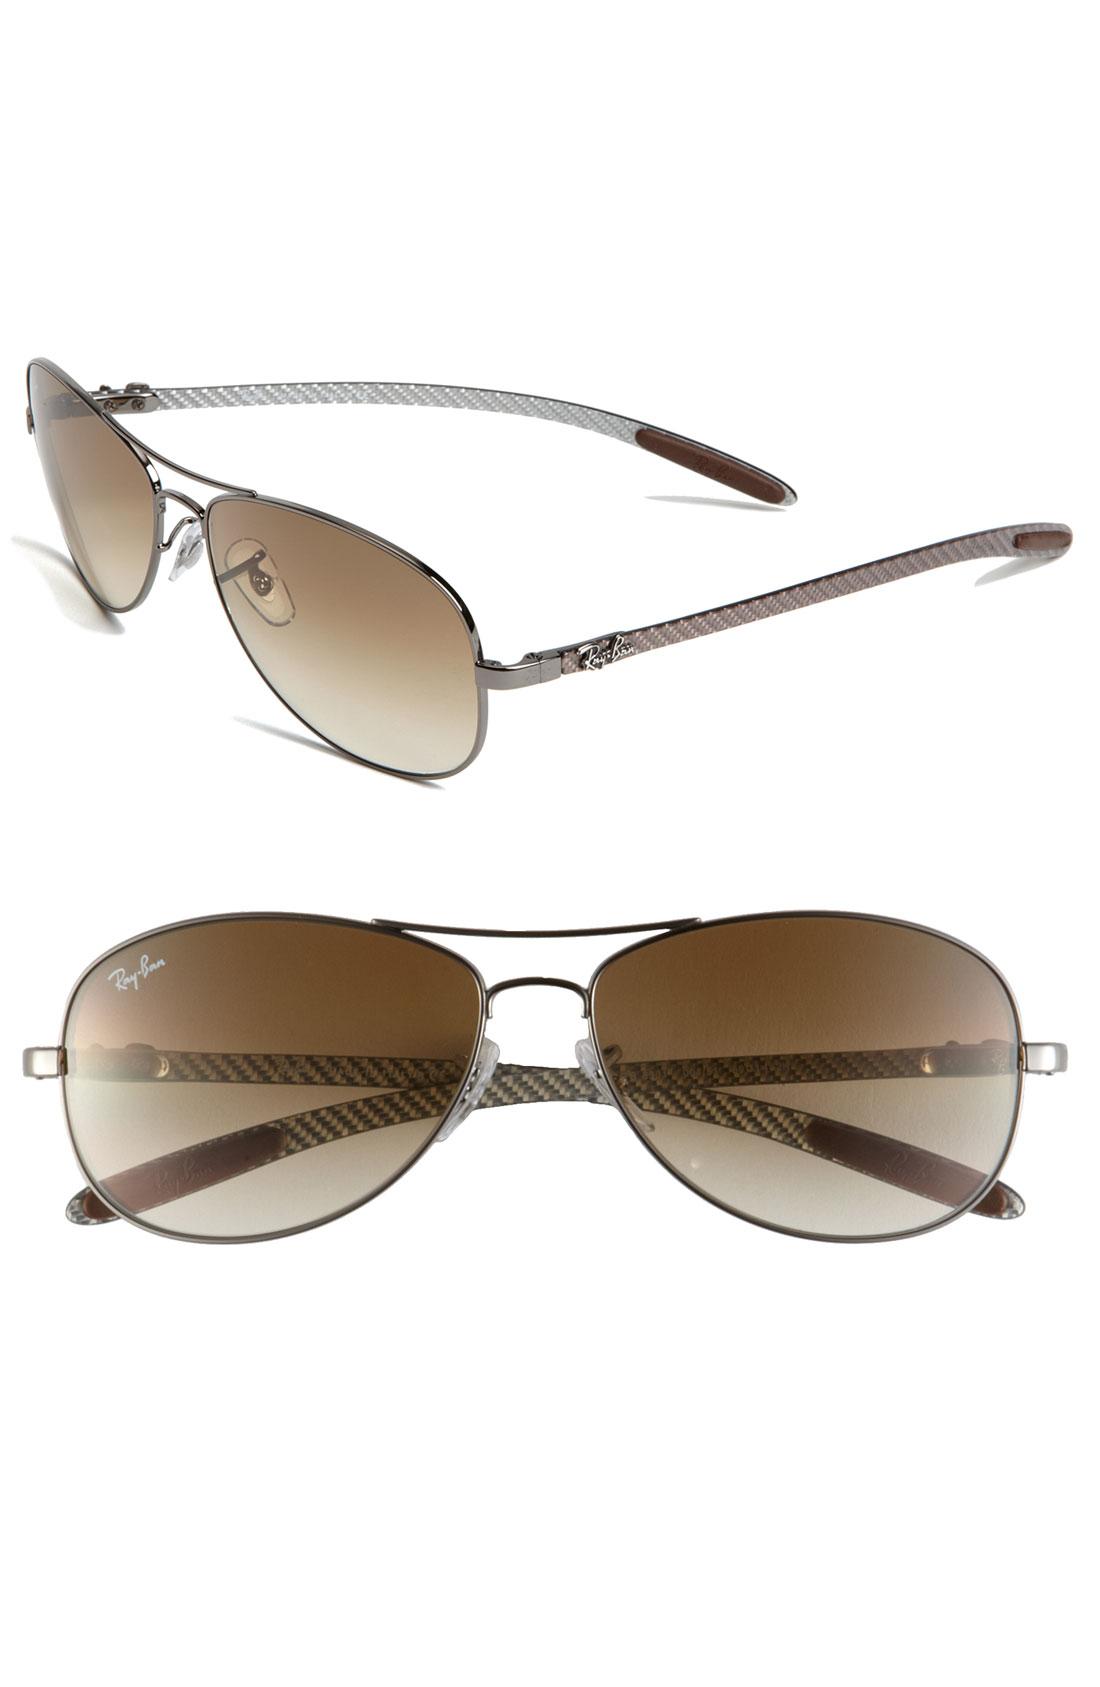 brown ray ban aviators sunglasses